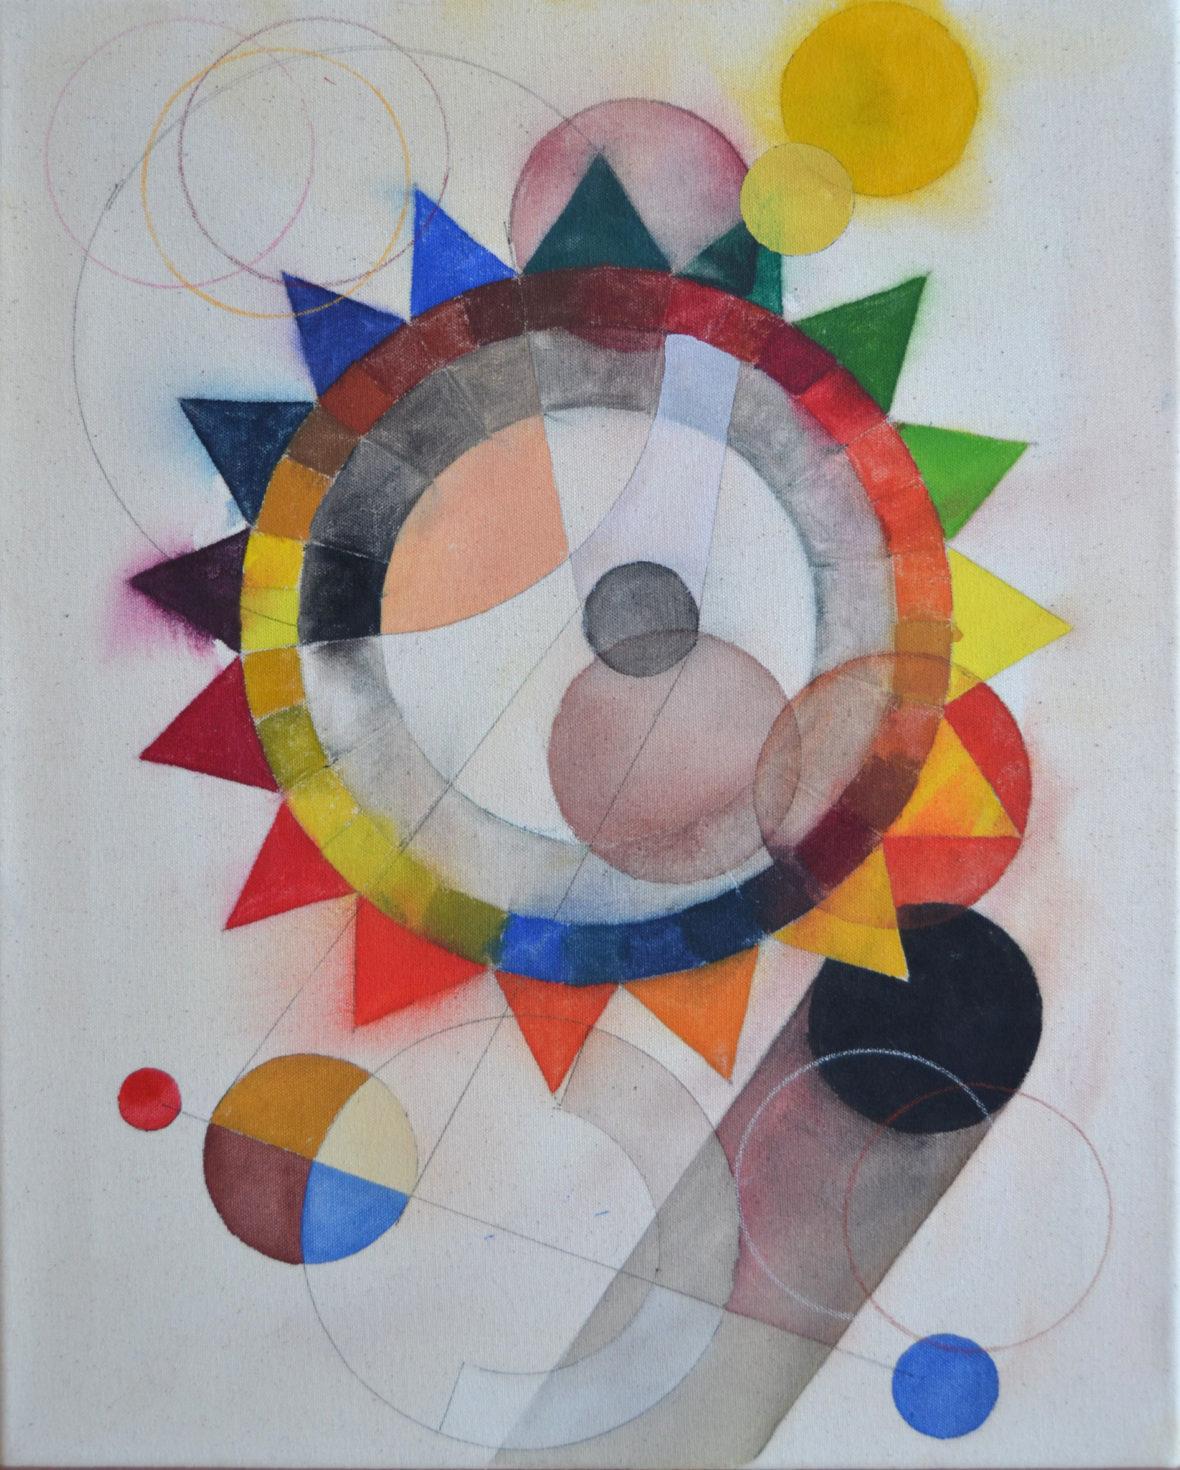 Abstract Composition (colour wheel) I